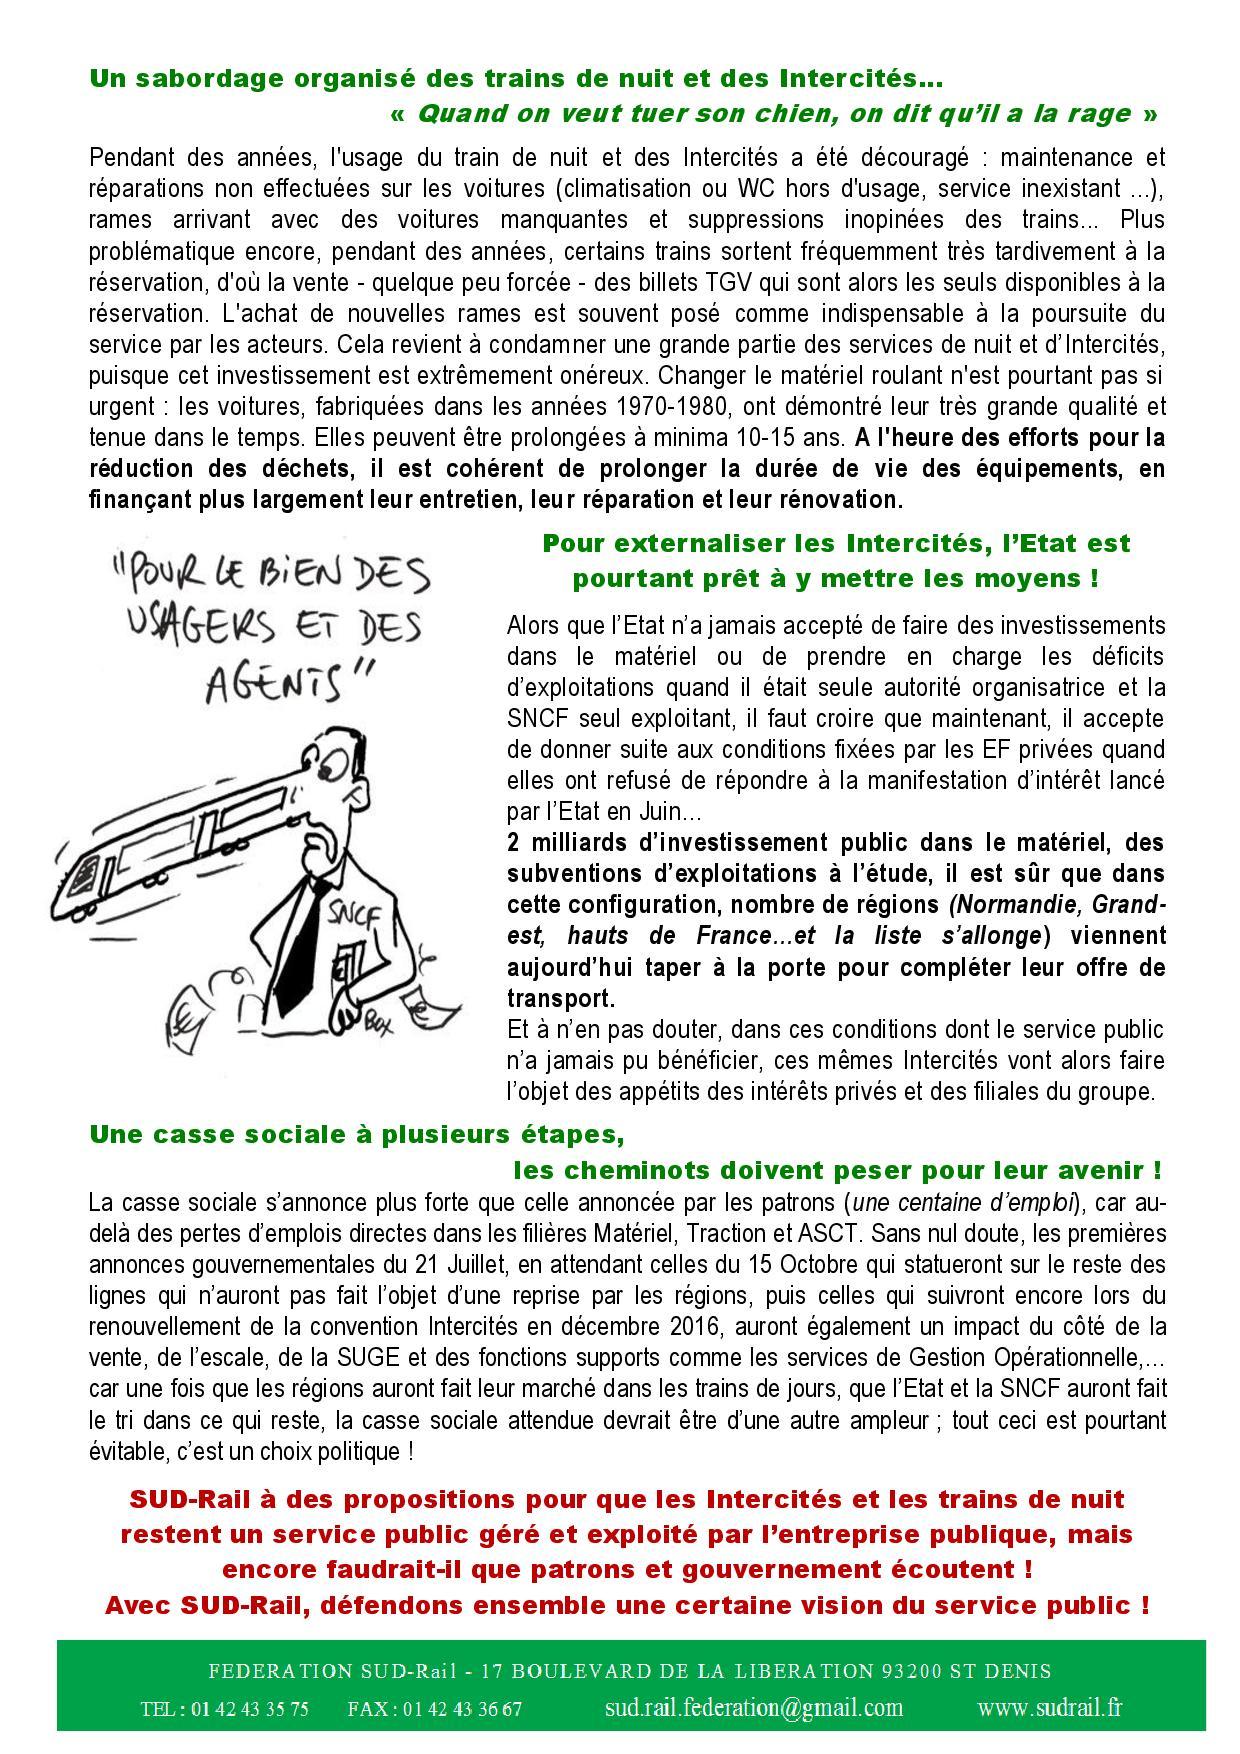 intercites-trains-nuit-09-2016-page-002